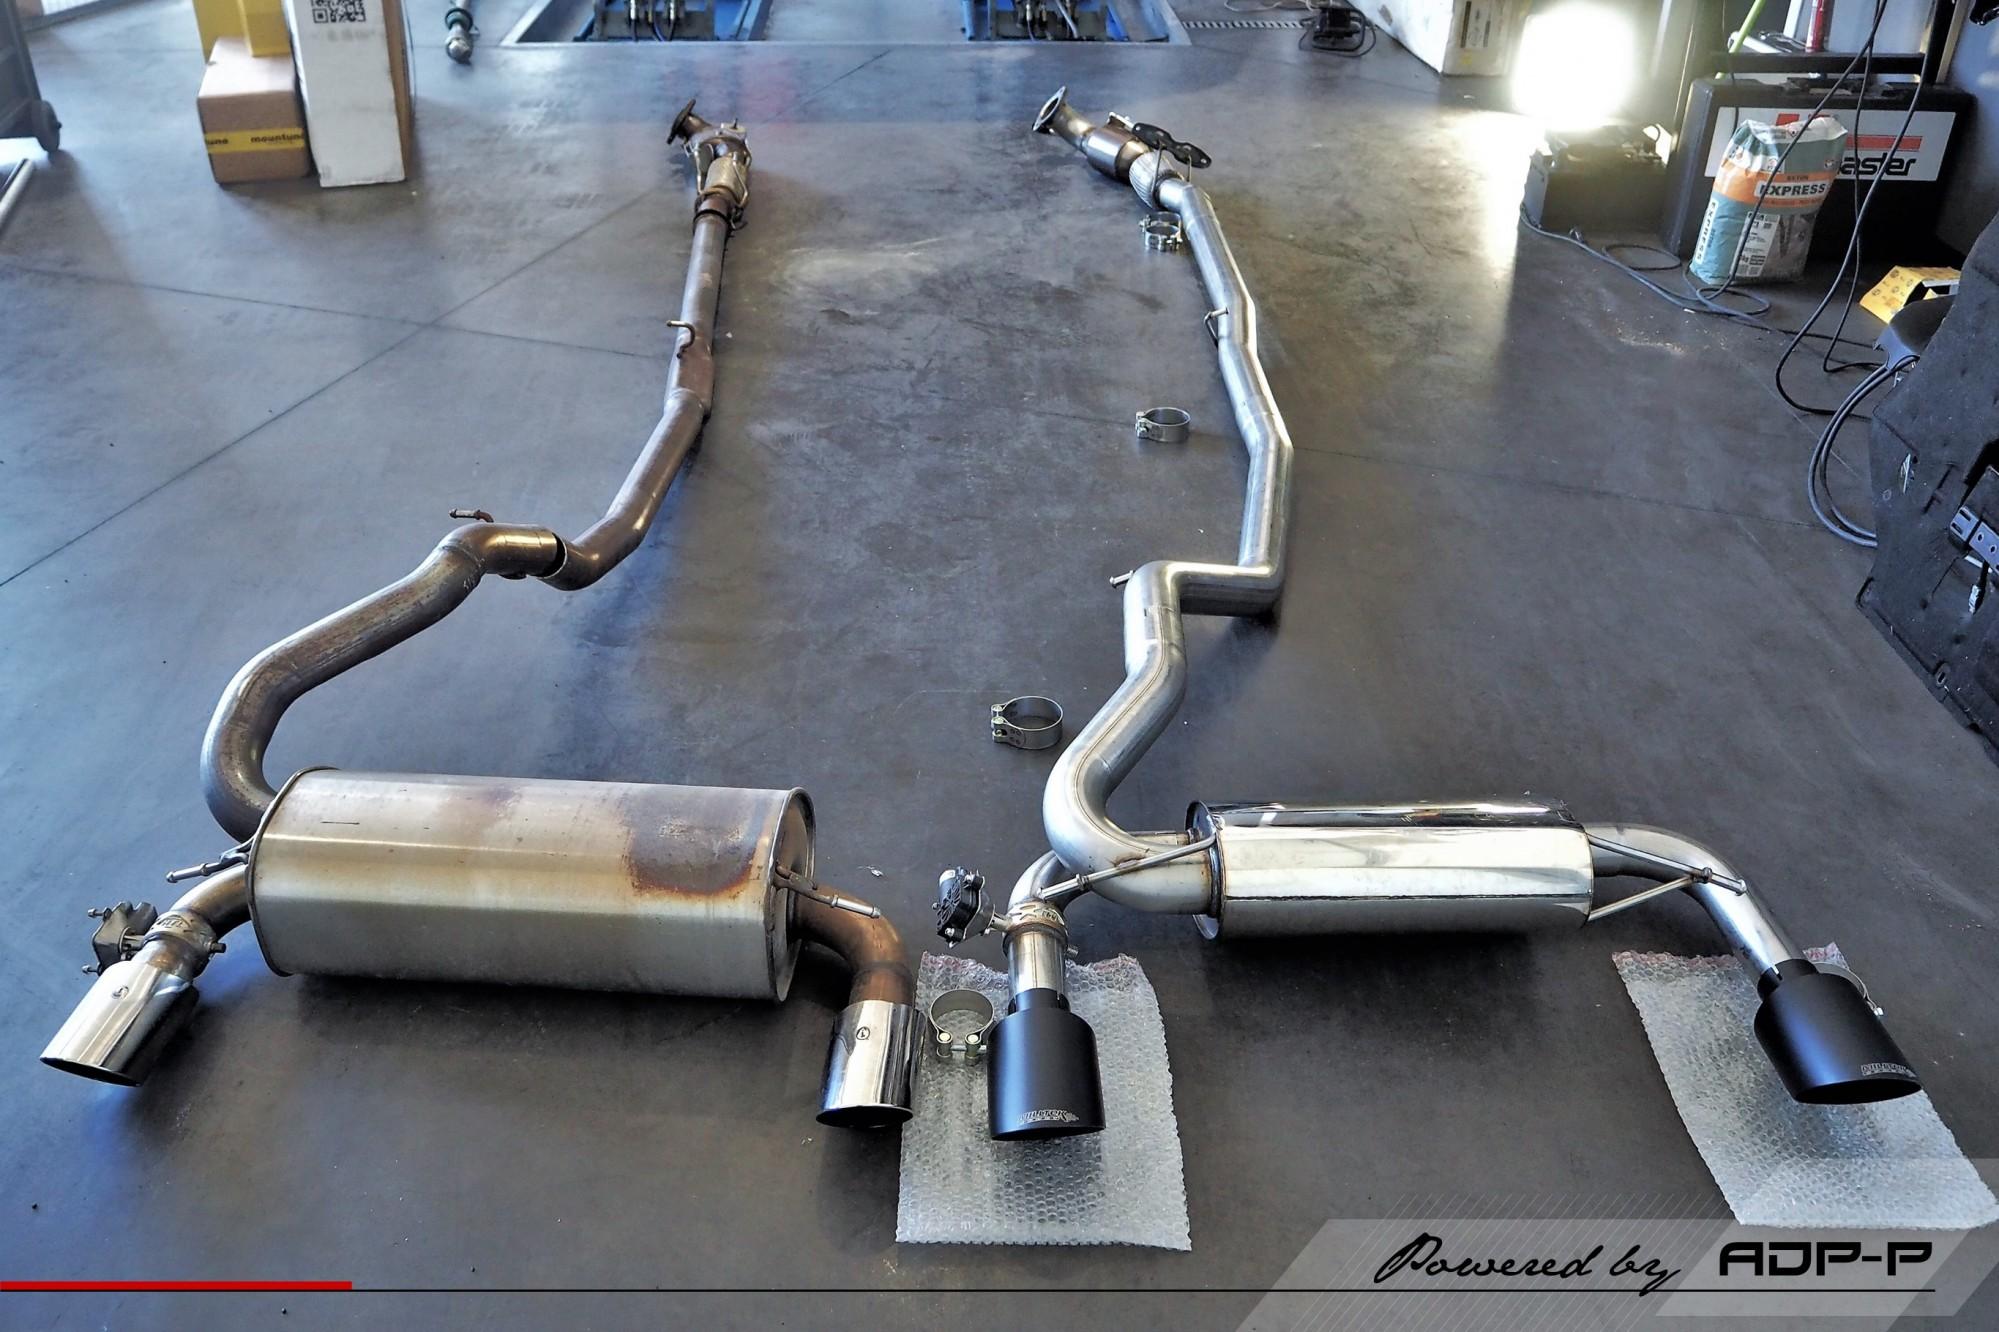 Ligne complète Milltek Salon de Provence - Ford Focus RS 2.3T Ecoboost 350cv - ADP Performance